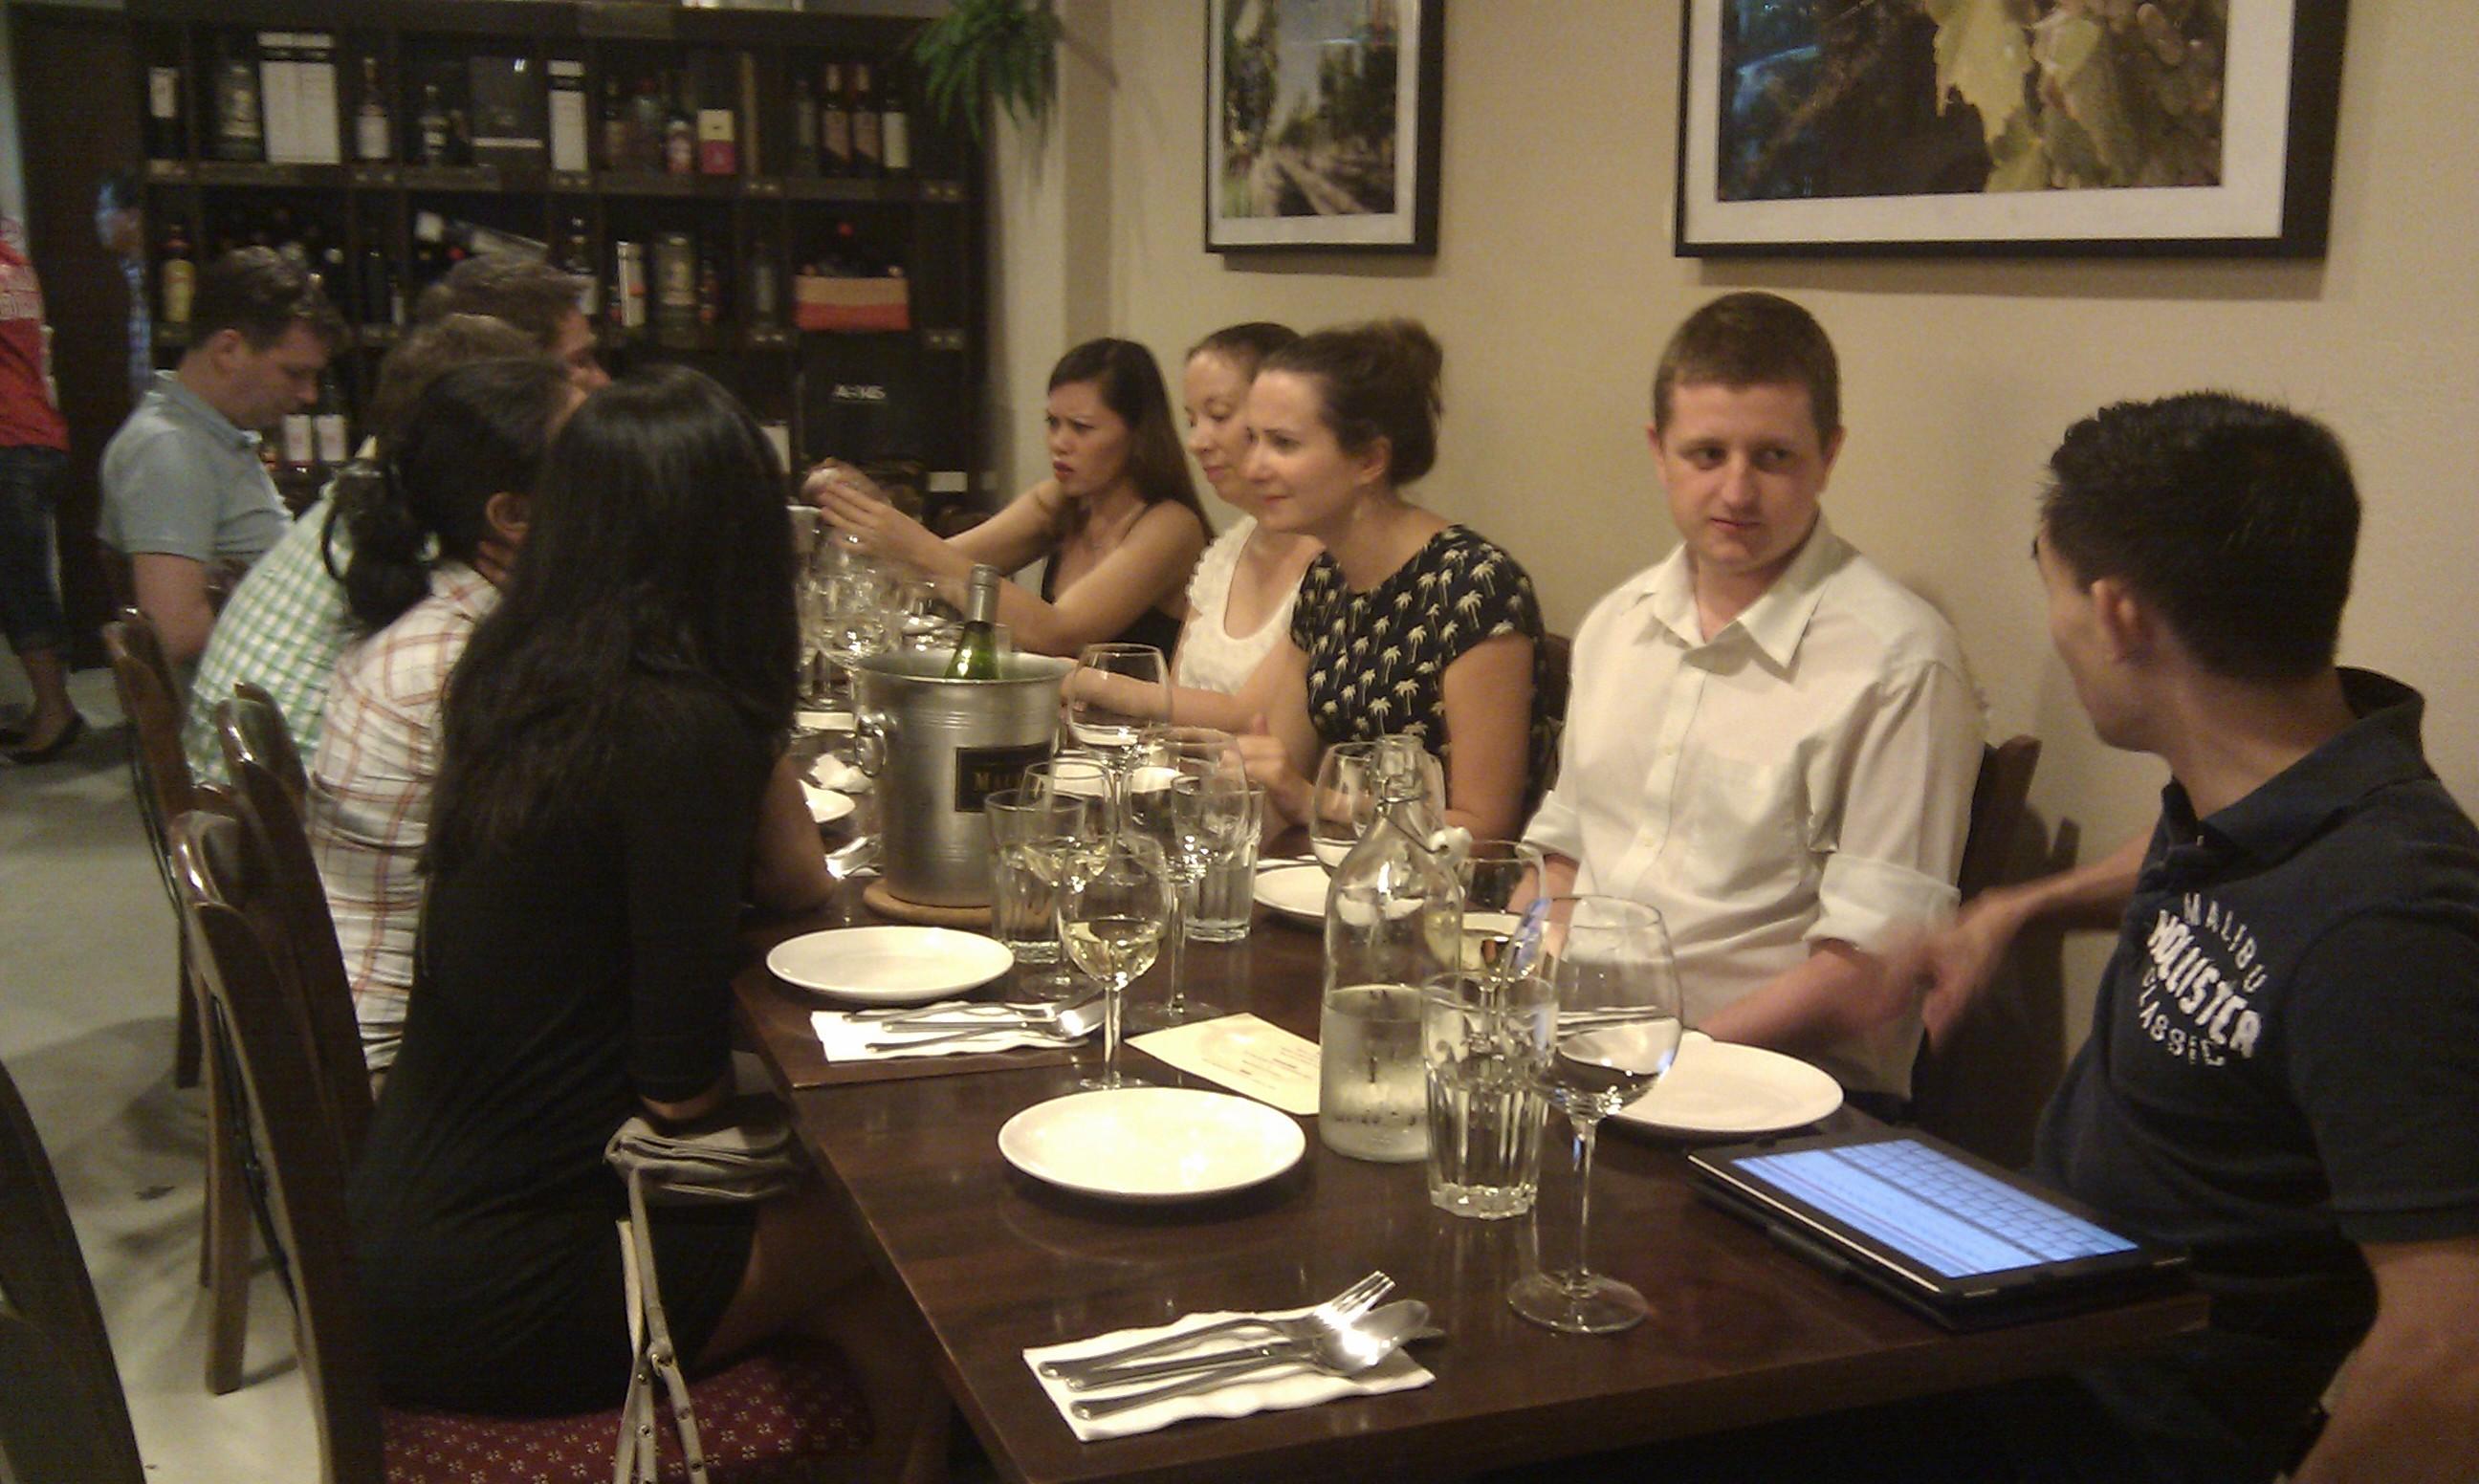 'Classics' wine dinner 16-Mar